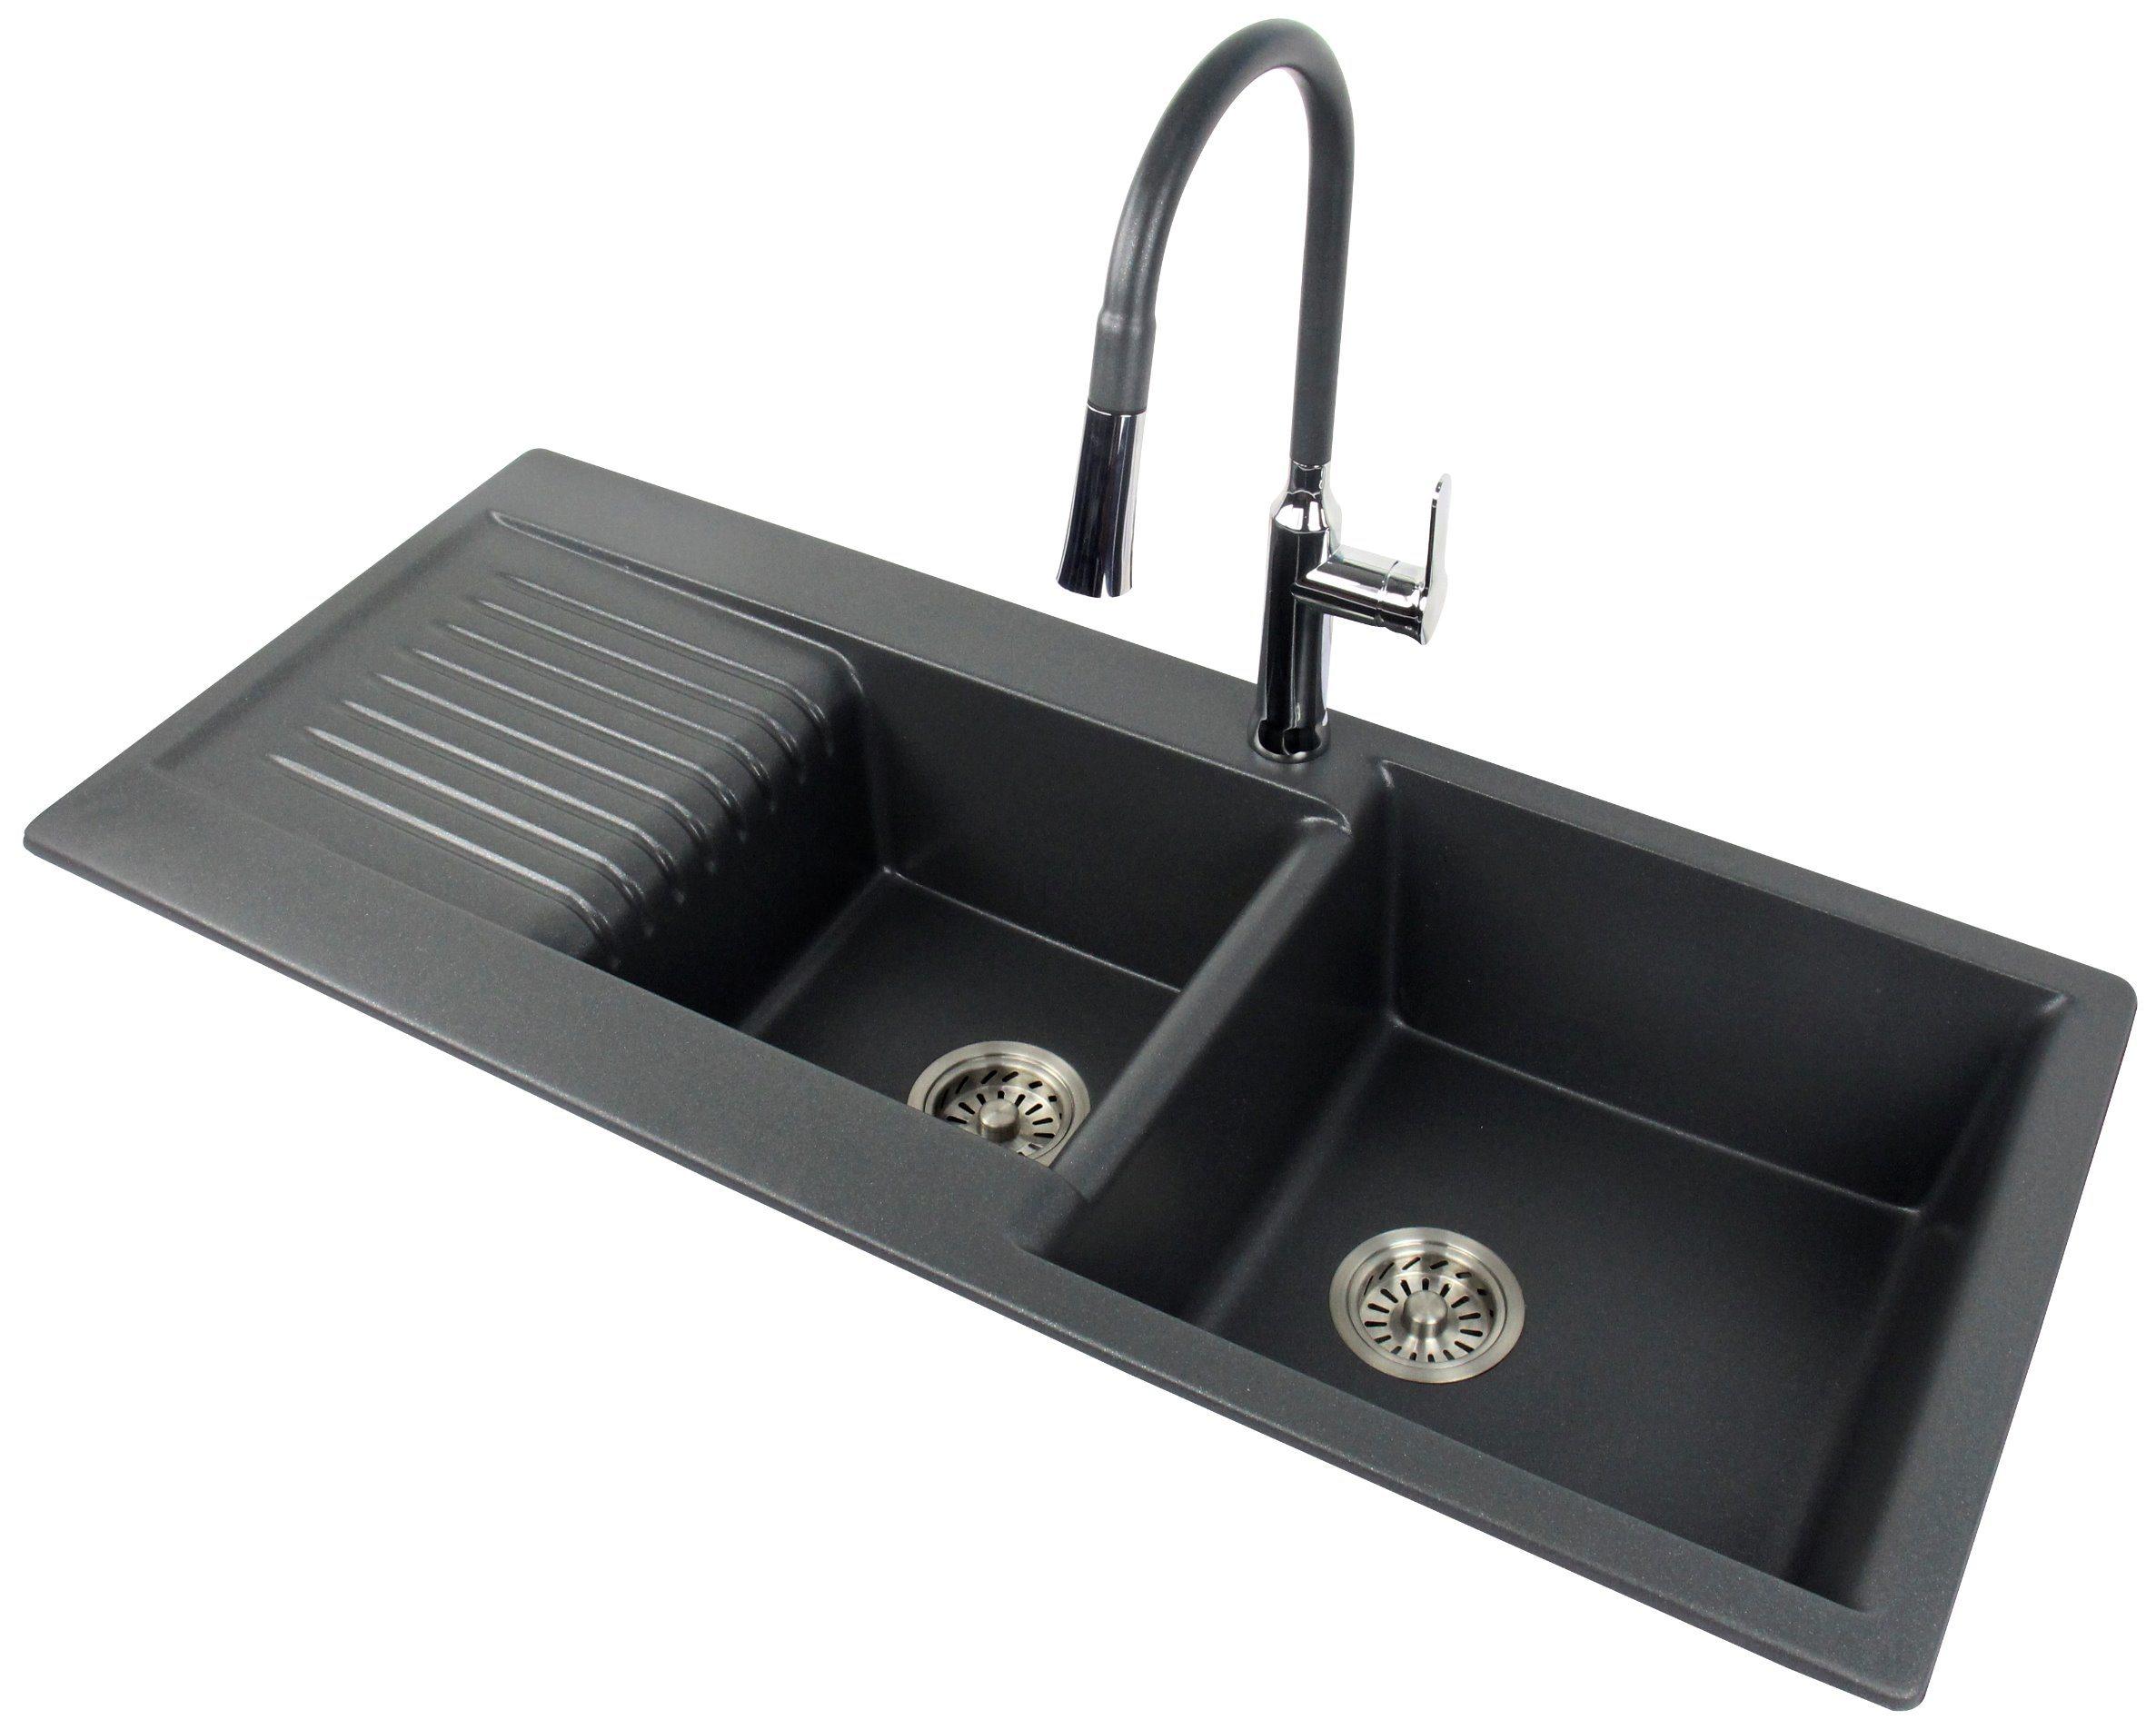 China Jm105 Custom Size Kitchen Sink Double Bowl With Drainboard China Quartz Stone Kitchen Sink Kitchen Sink